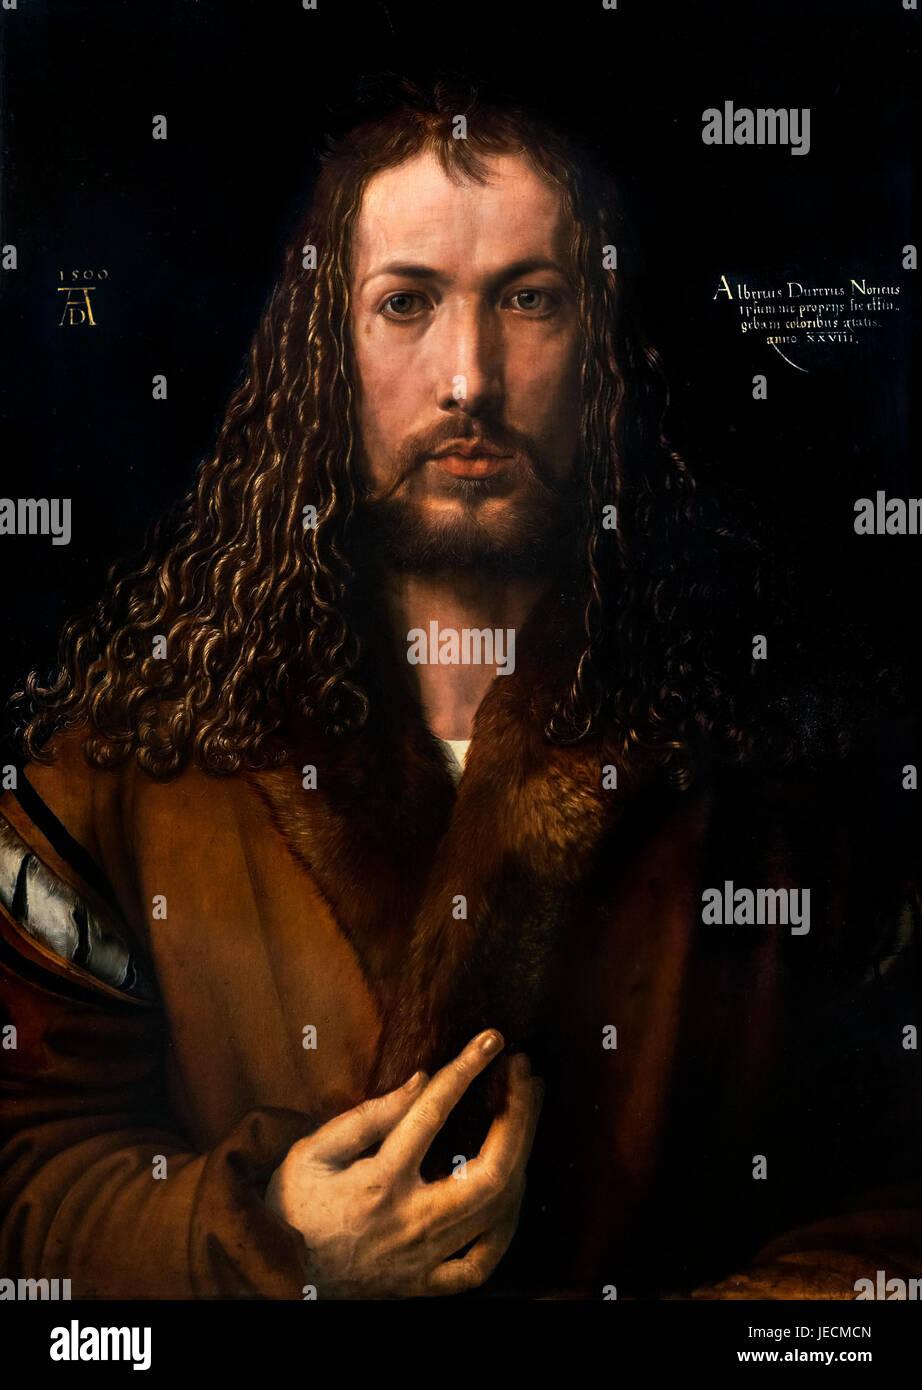 Albrecht Dürer (1471-1528), Self Portrait in a Fur Collar, oil on wood, 1500 - Stock Image